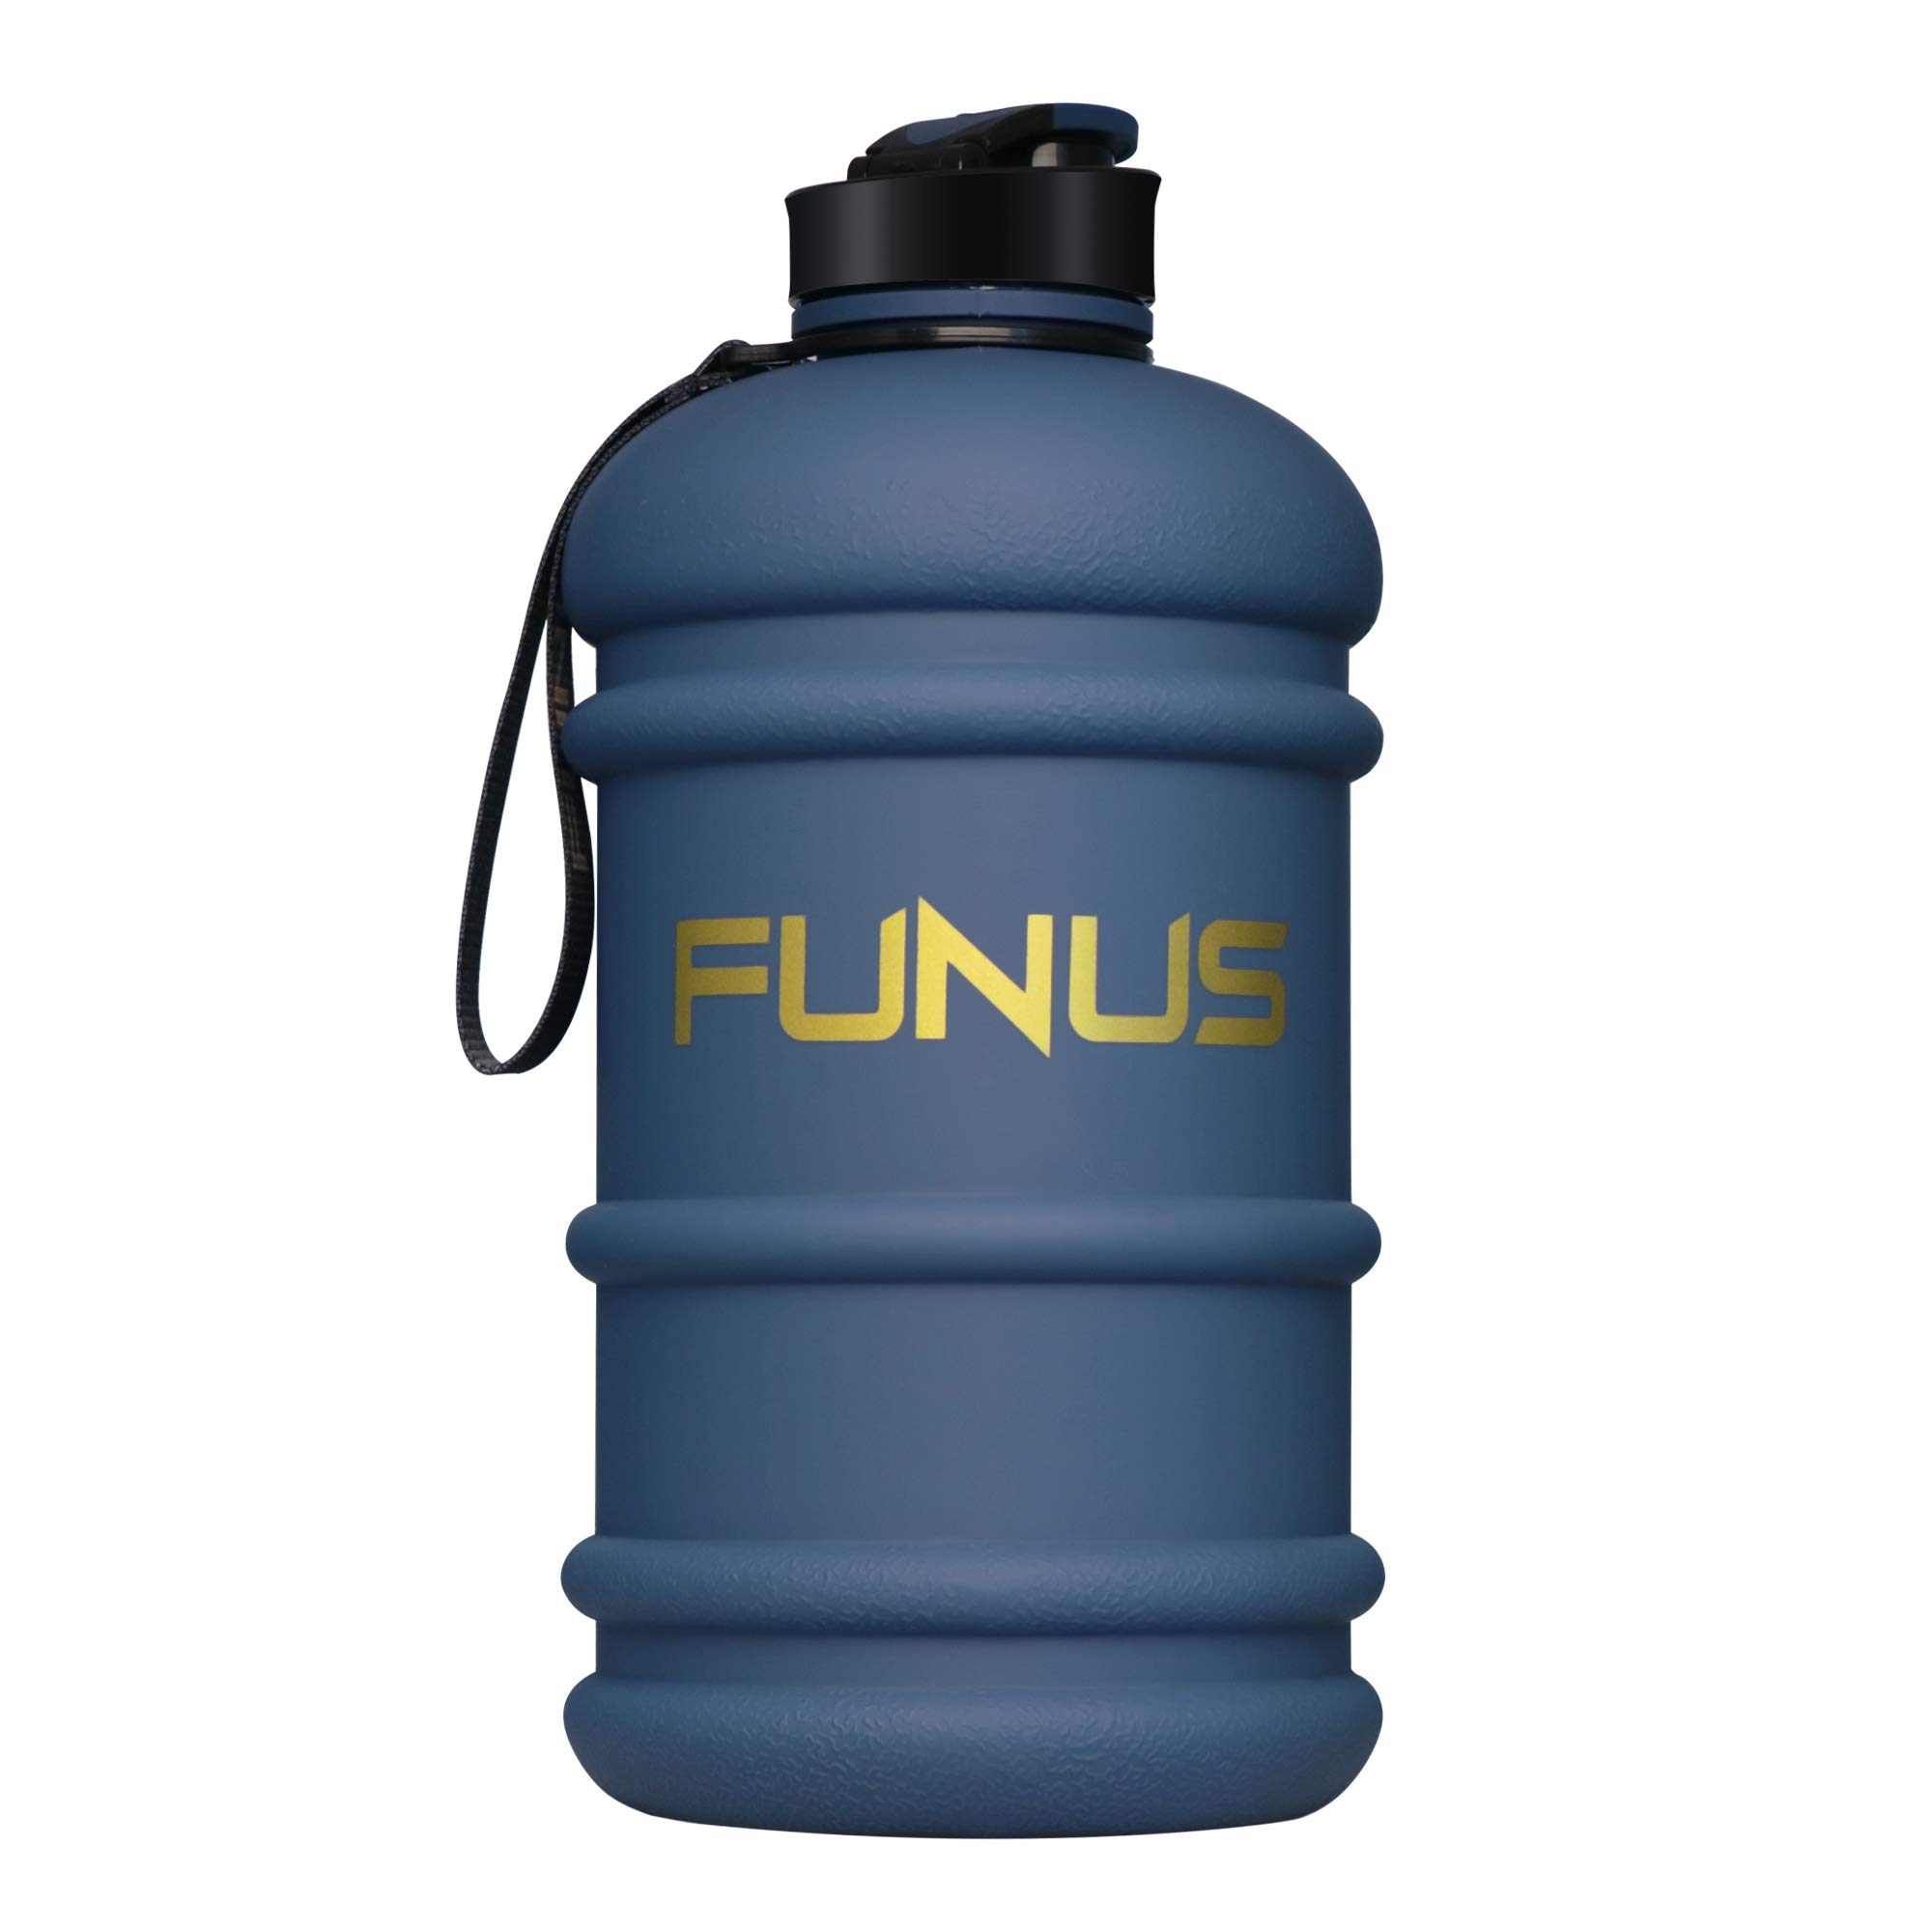 FUNUS Big Water Bottle 1.3L-2.2L Odorless Water Jug BPA Free Leak Proof Reusable Big Capacity for Men Women Fitness Gym Outdoor Climbing (2.2L Navy Blue) by FUNUS